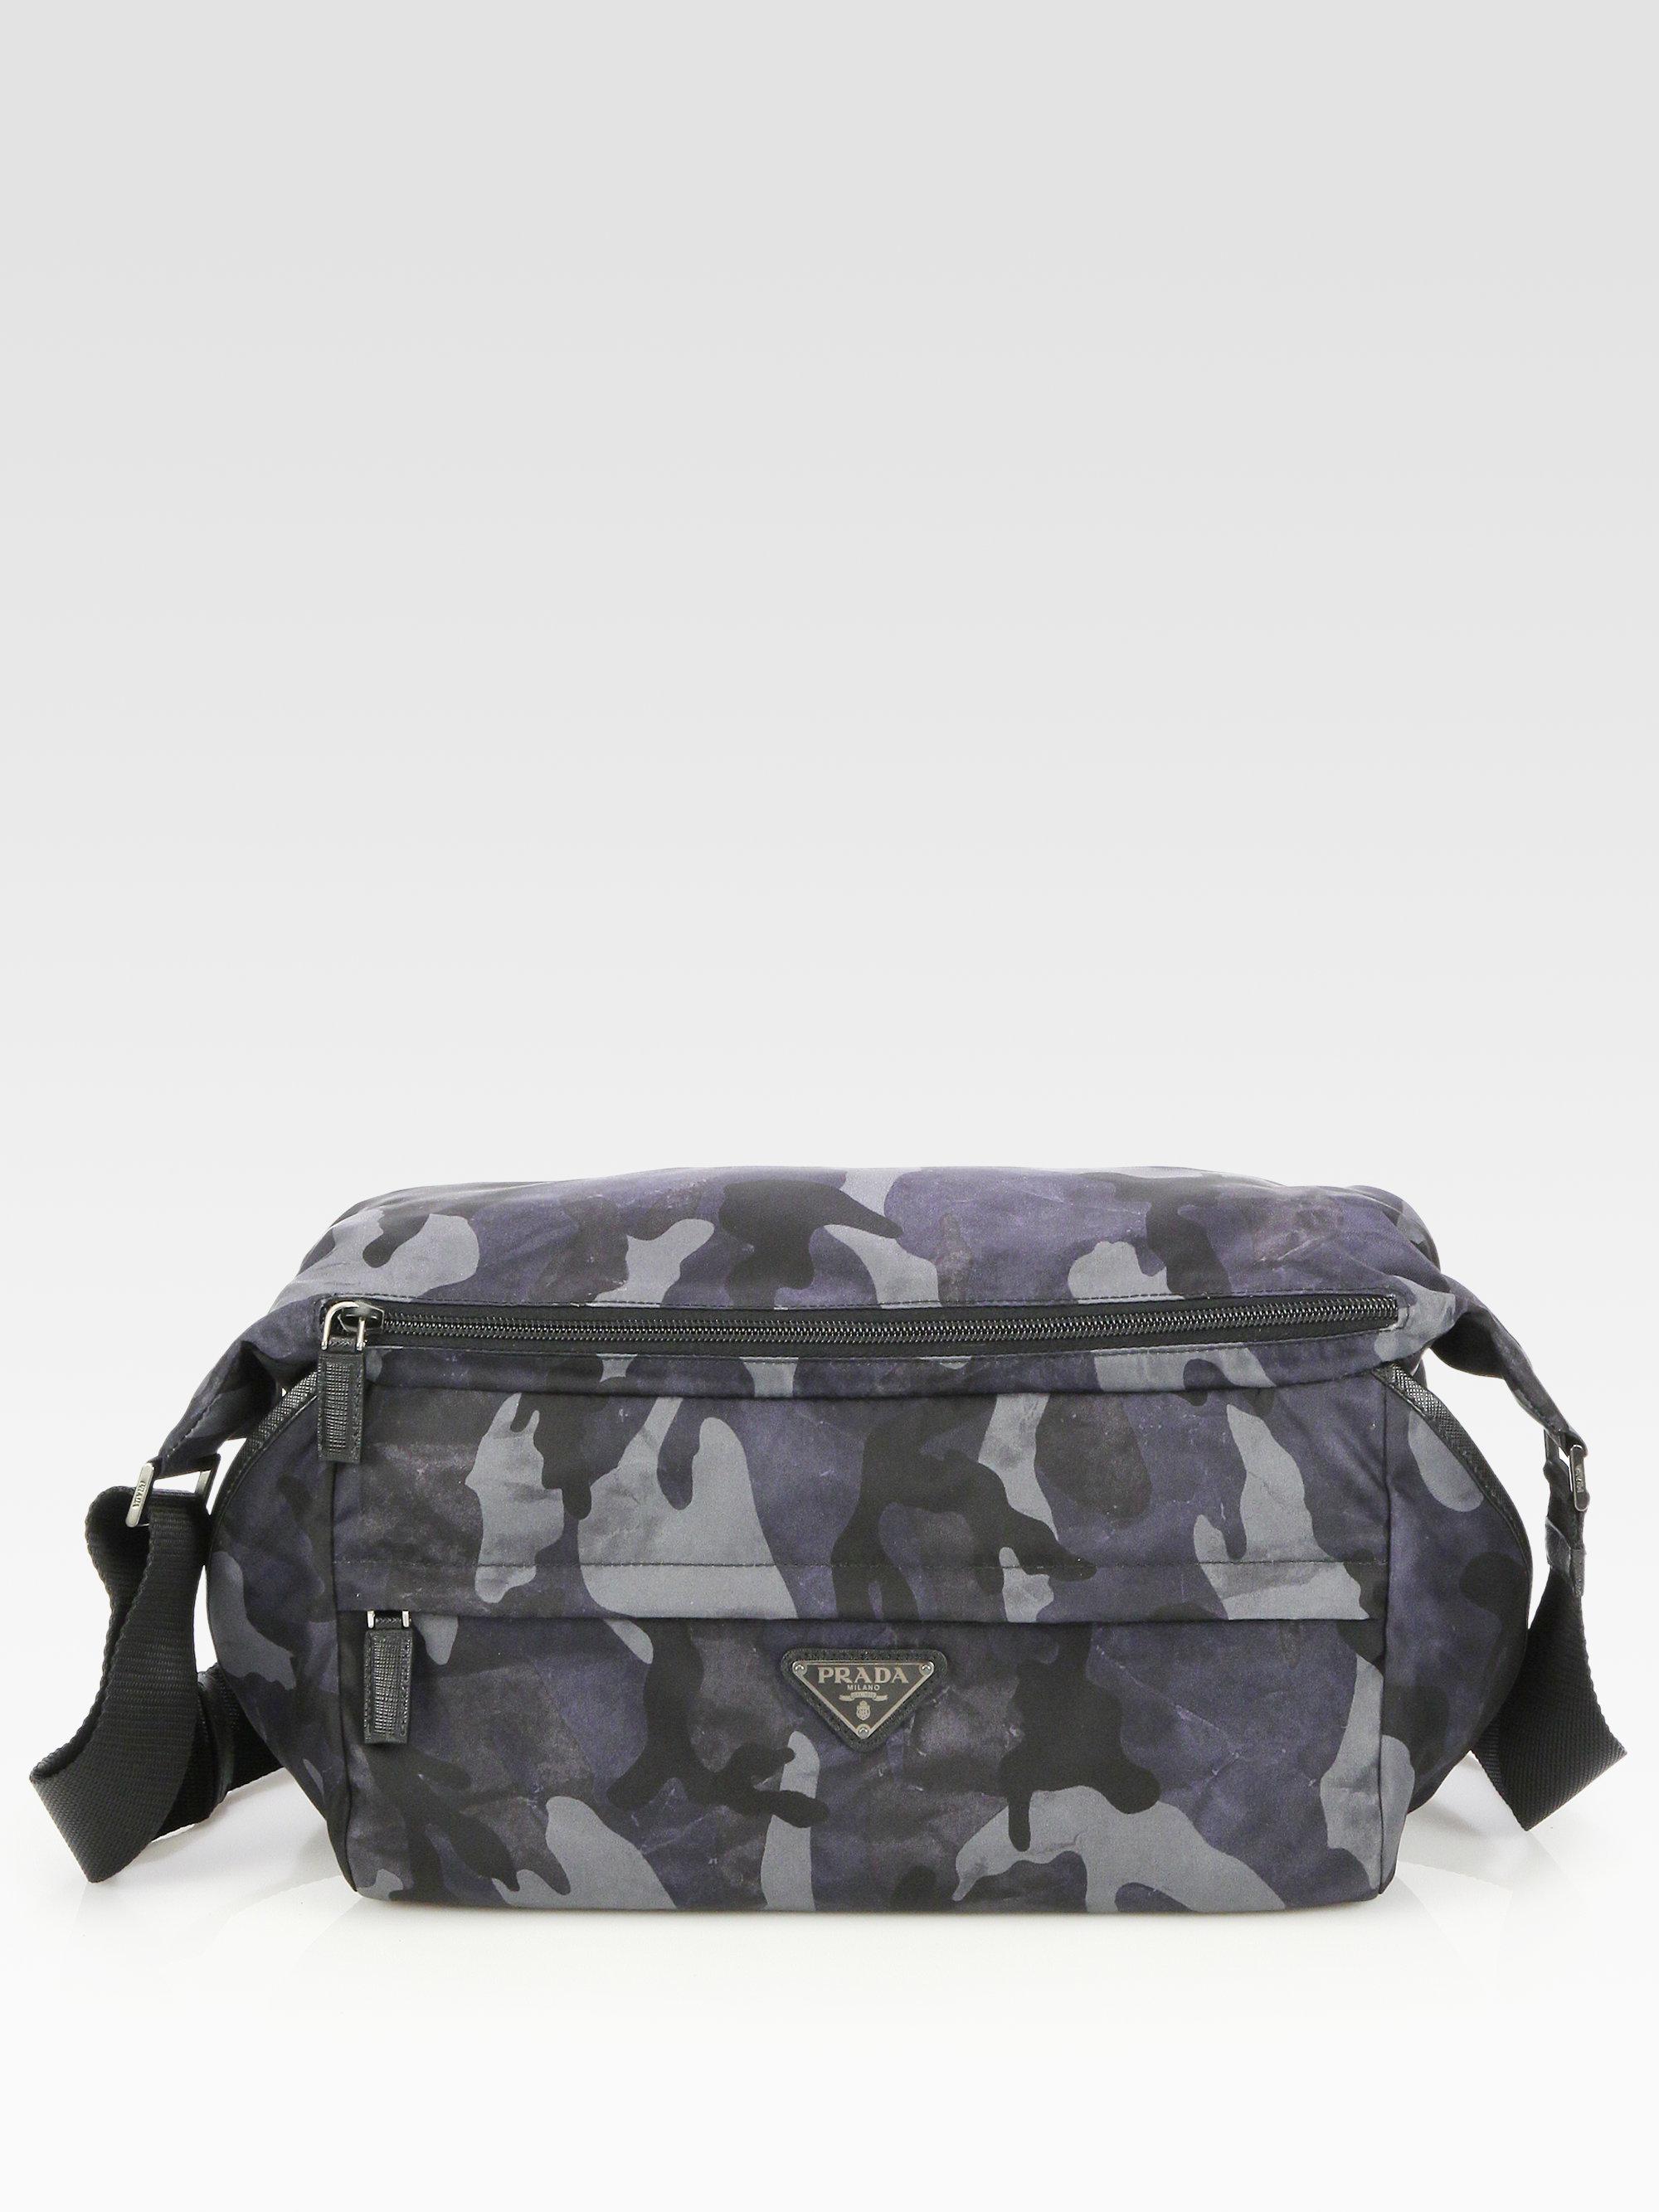 ed76f765a0ab ... usa lyst prada small nylon shoulder bag in blue for men 7e8b2 2d84f